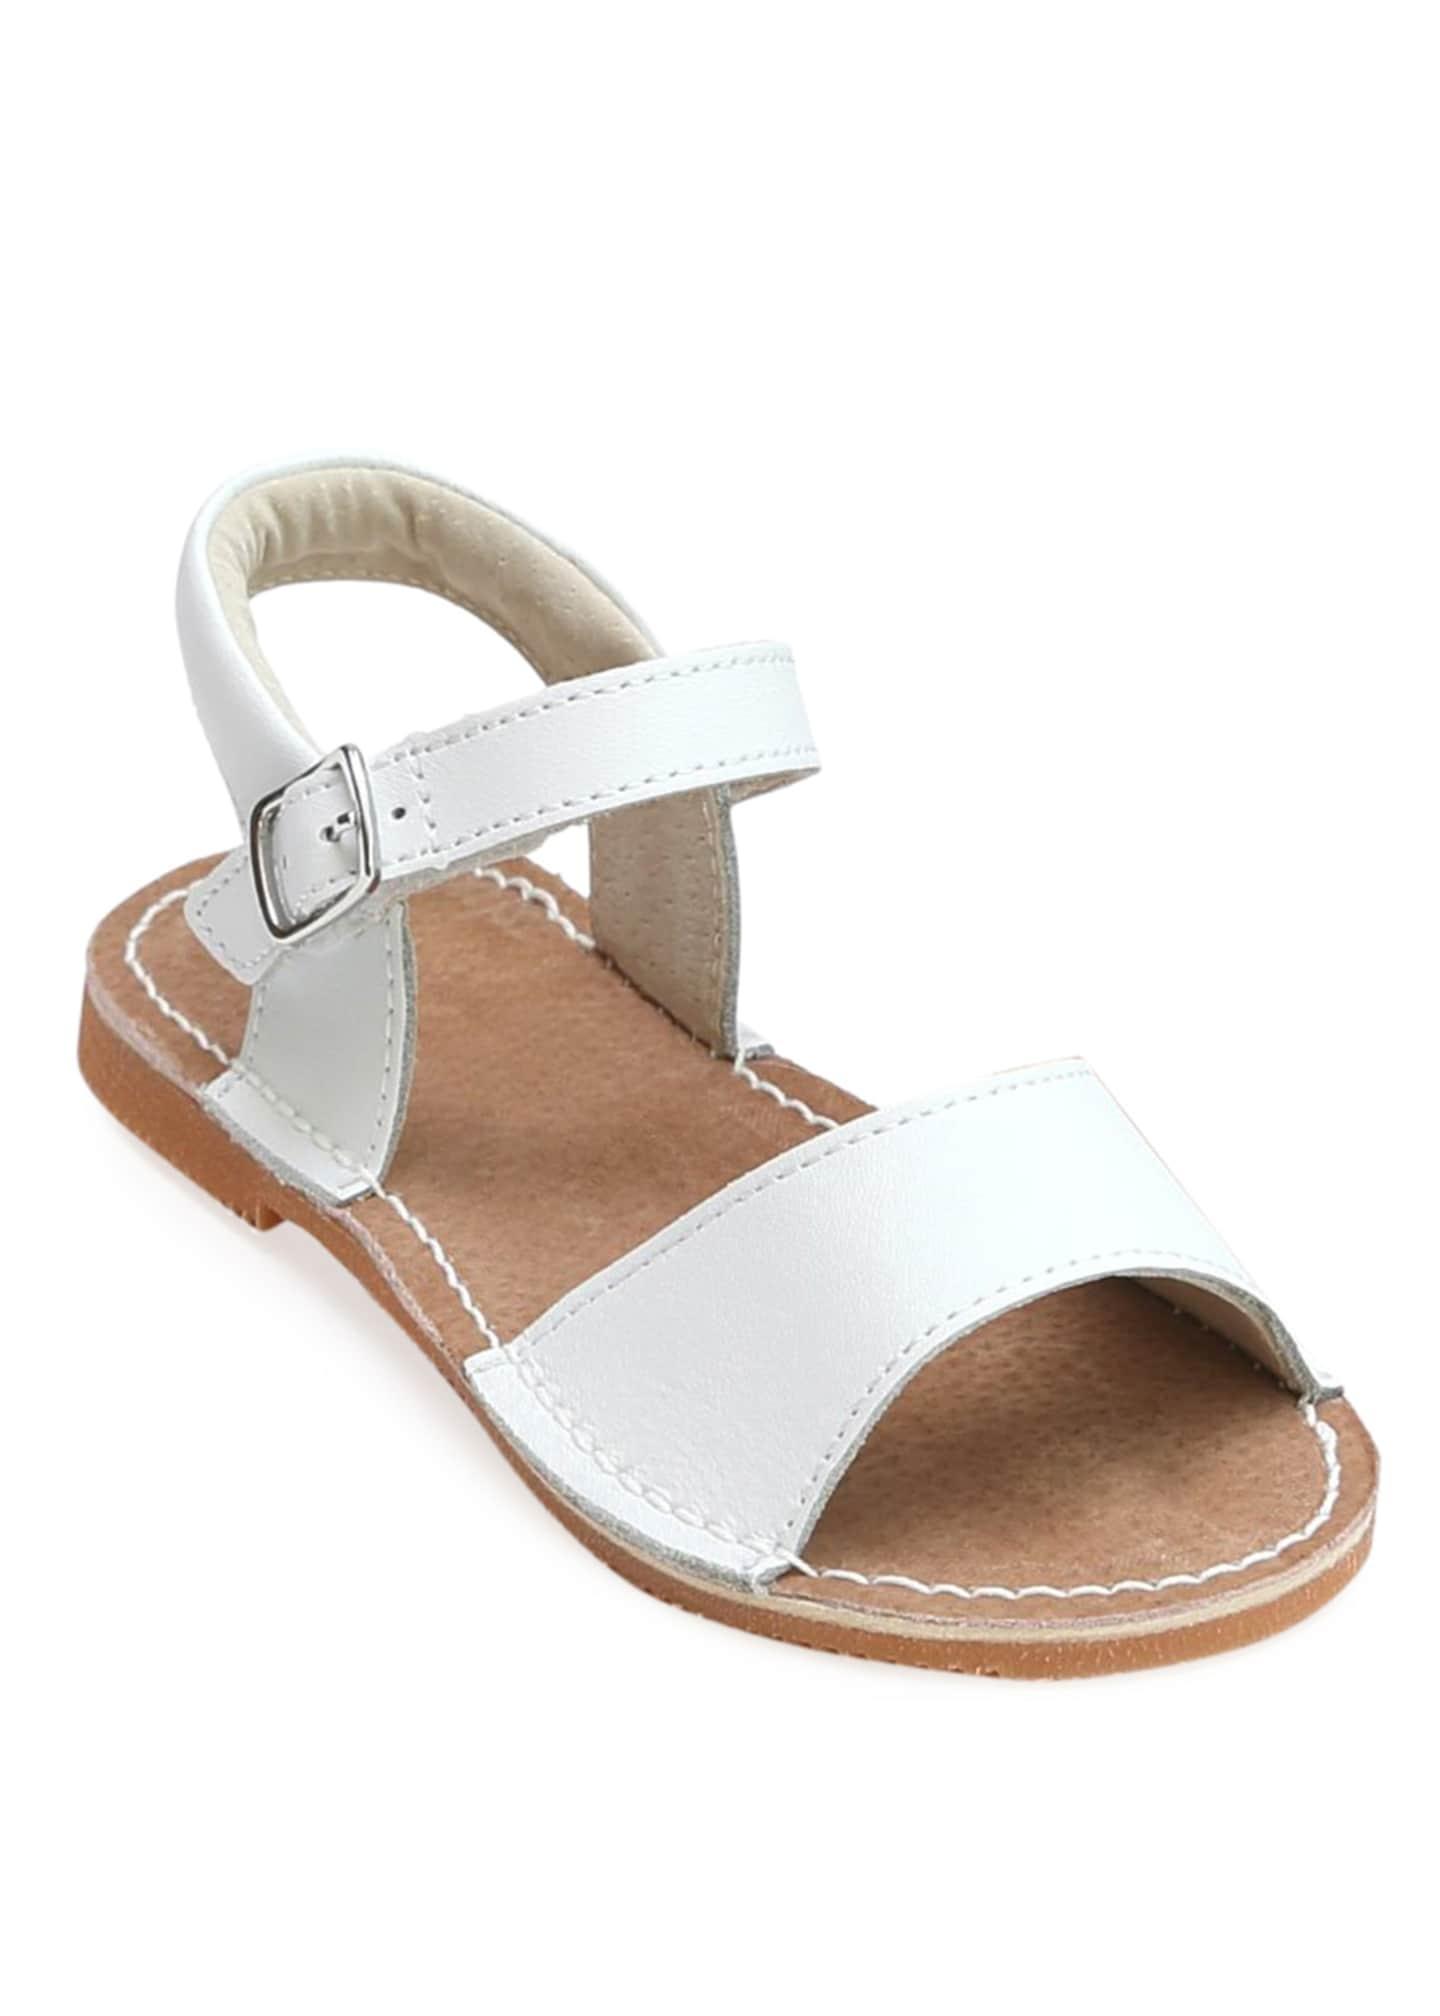 L'Amour Shoes Kayla Open Toe Sandals, Kids